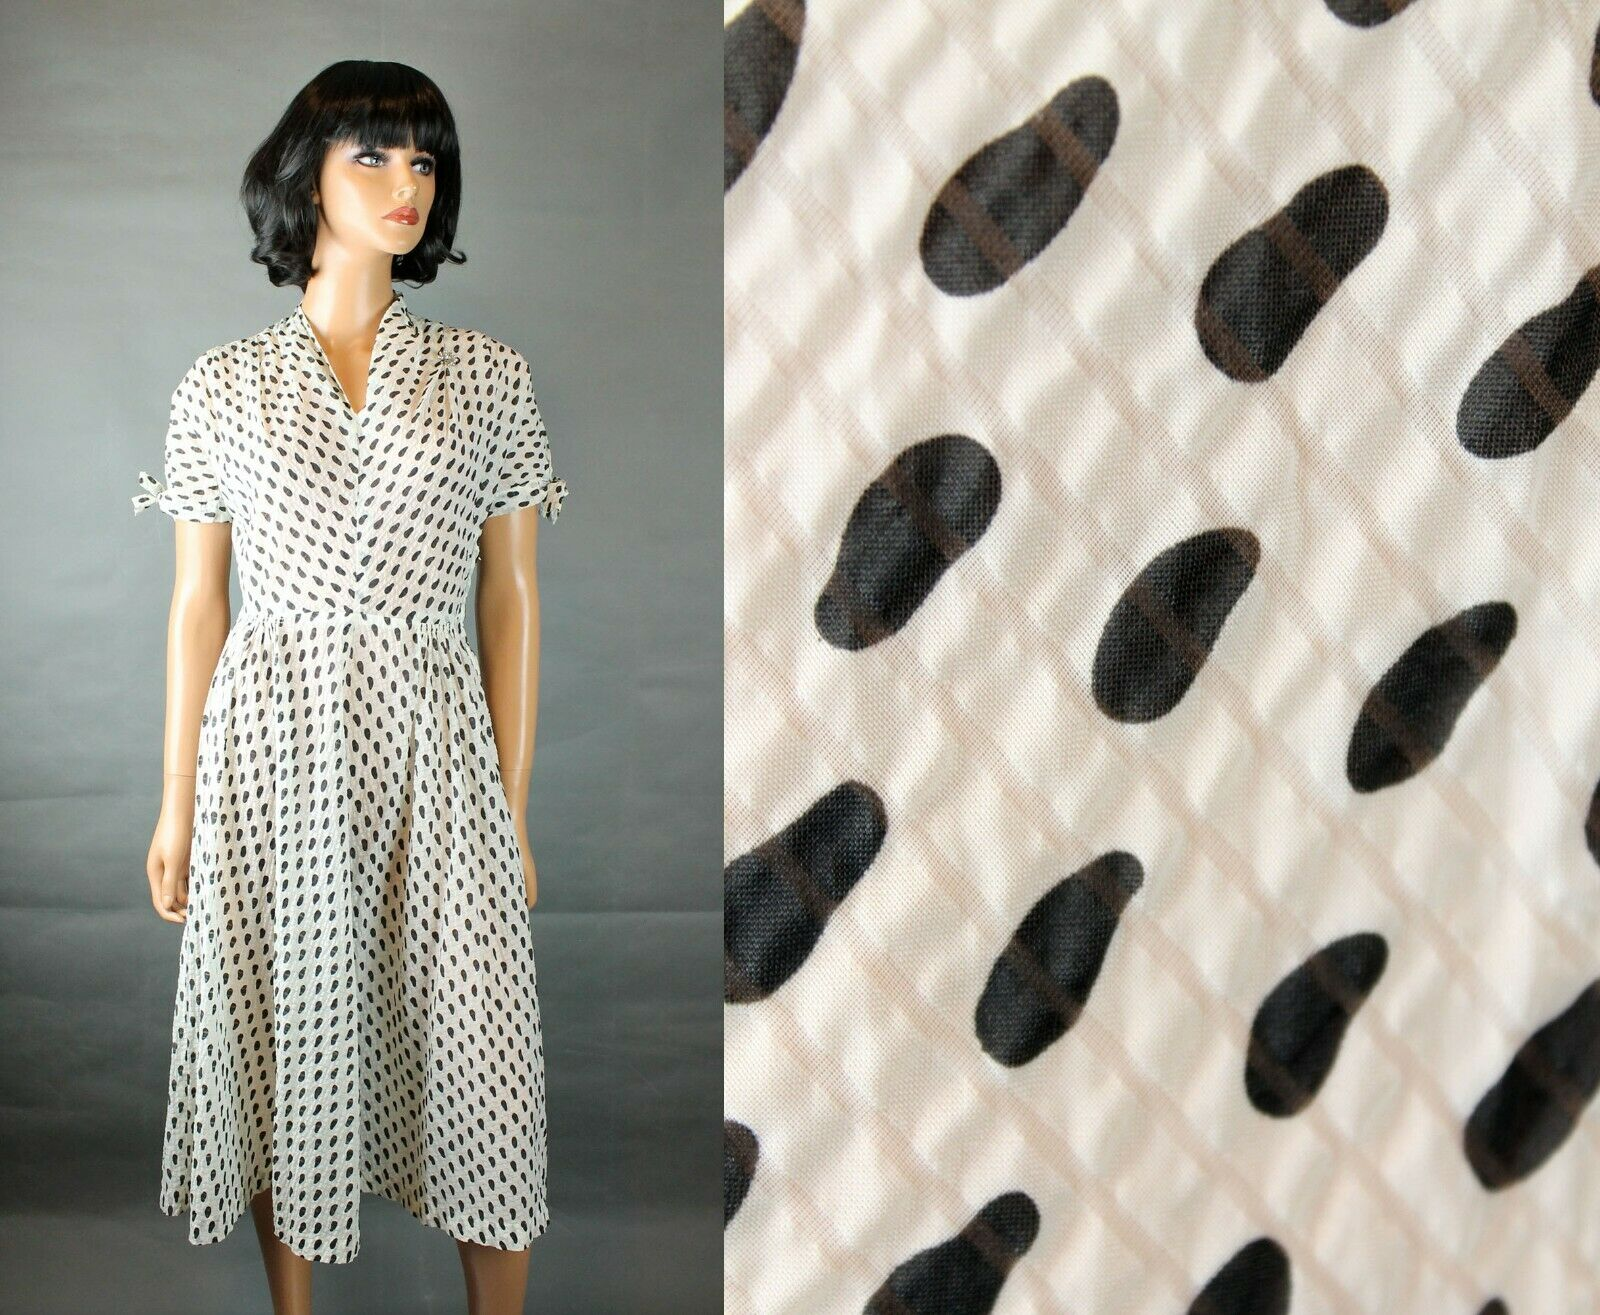 50s Party Dress S Vintage Sheer Chiffon Black White Polka Dot Striped Prom Gown